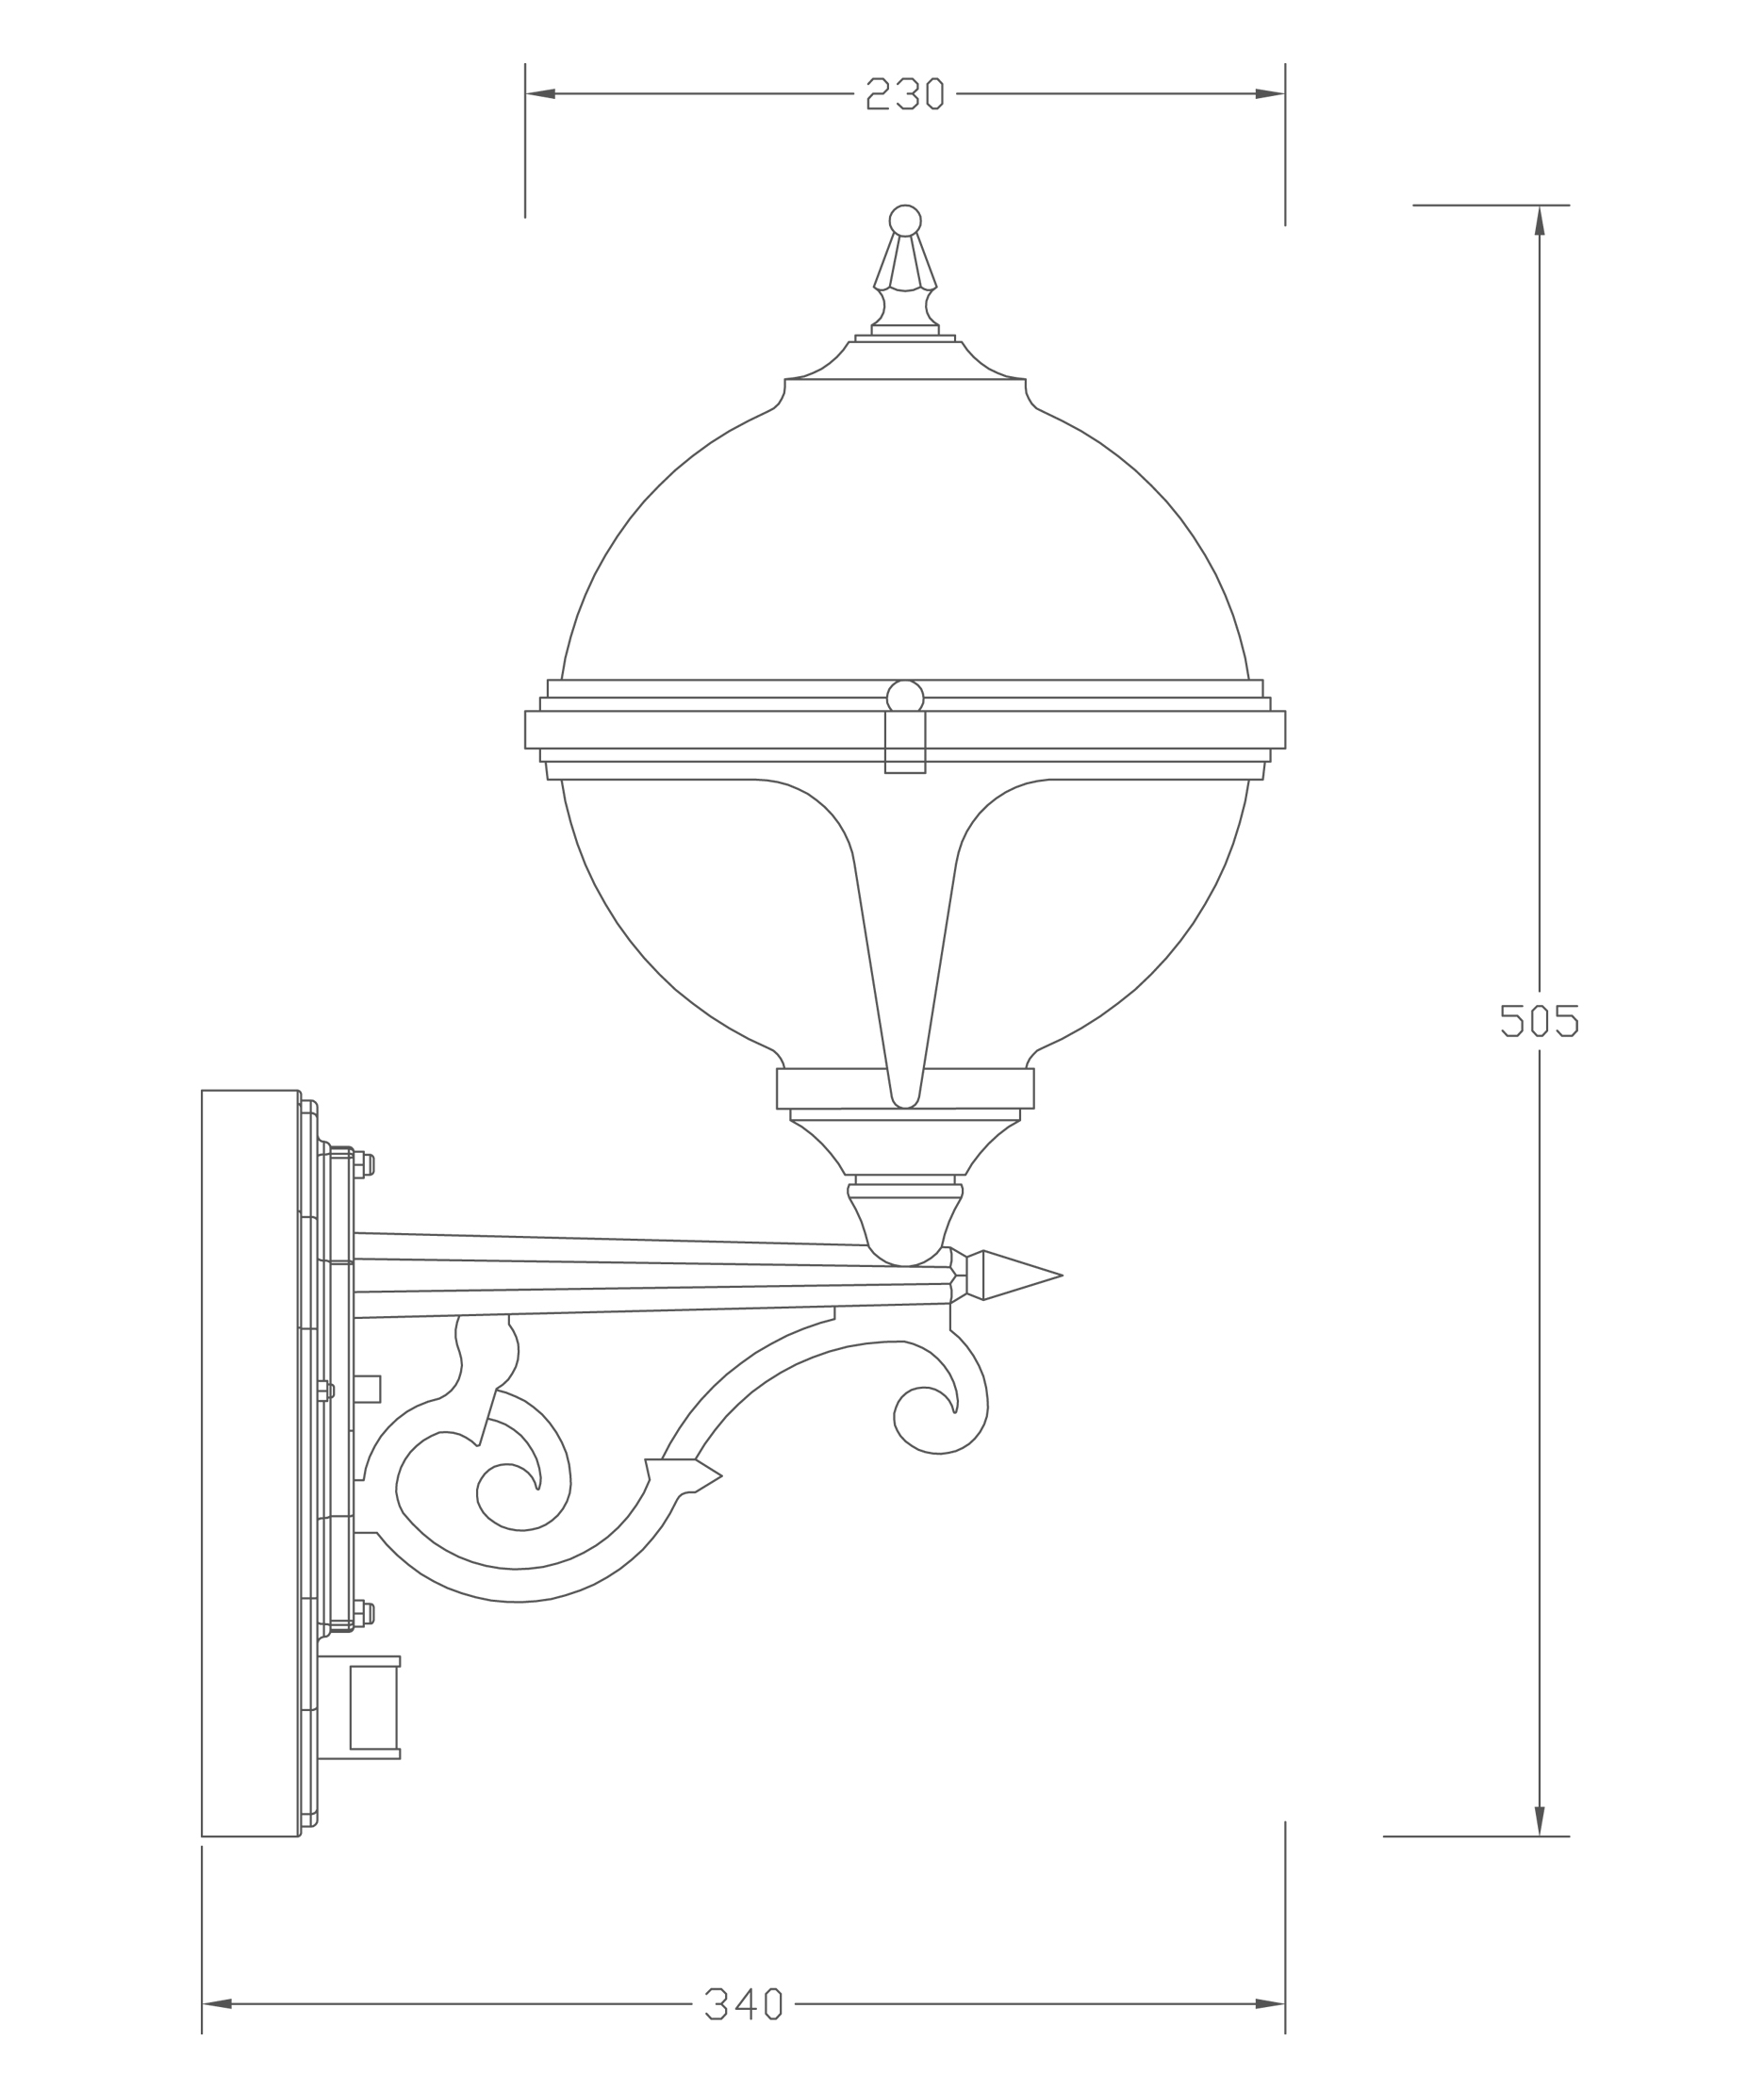 Wall Light With Pir Motion Sensor